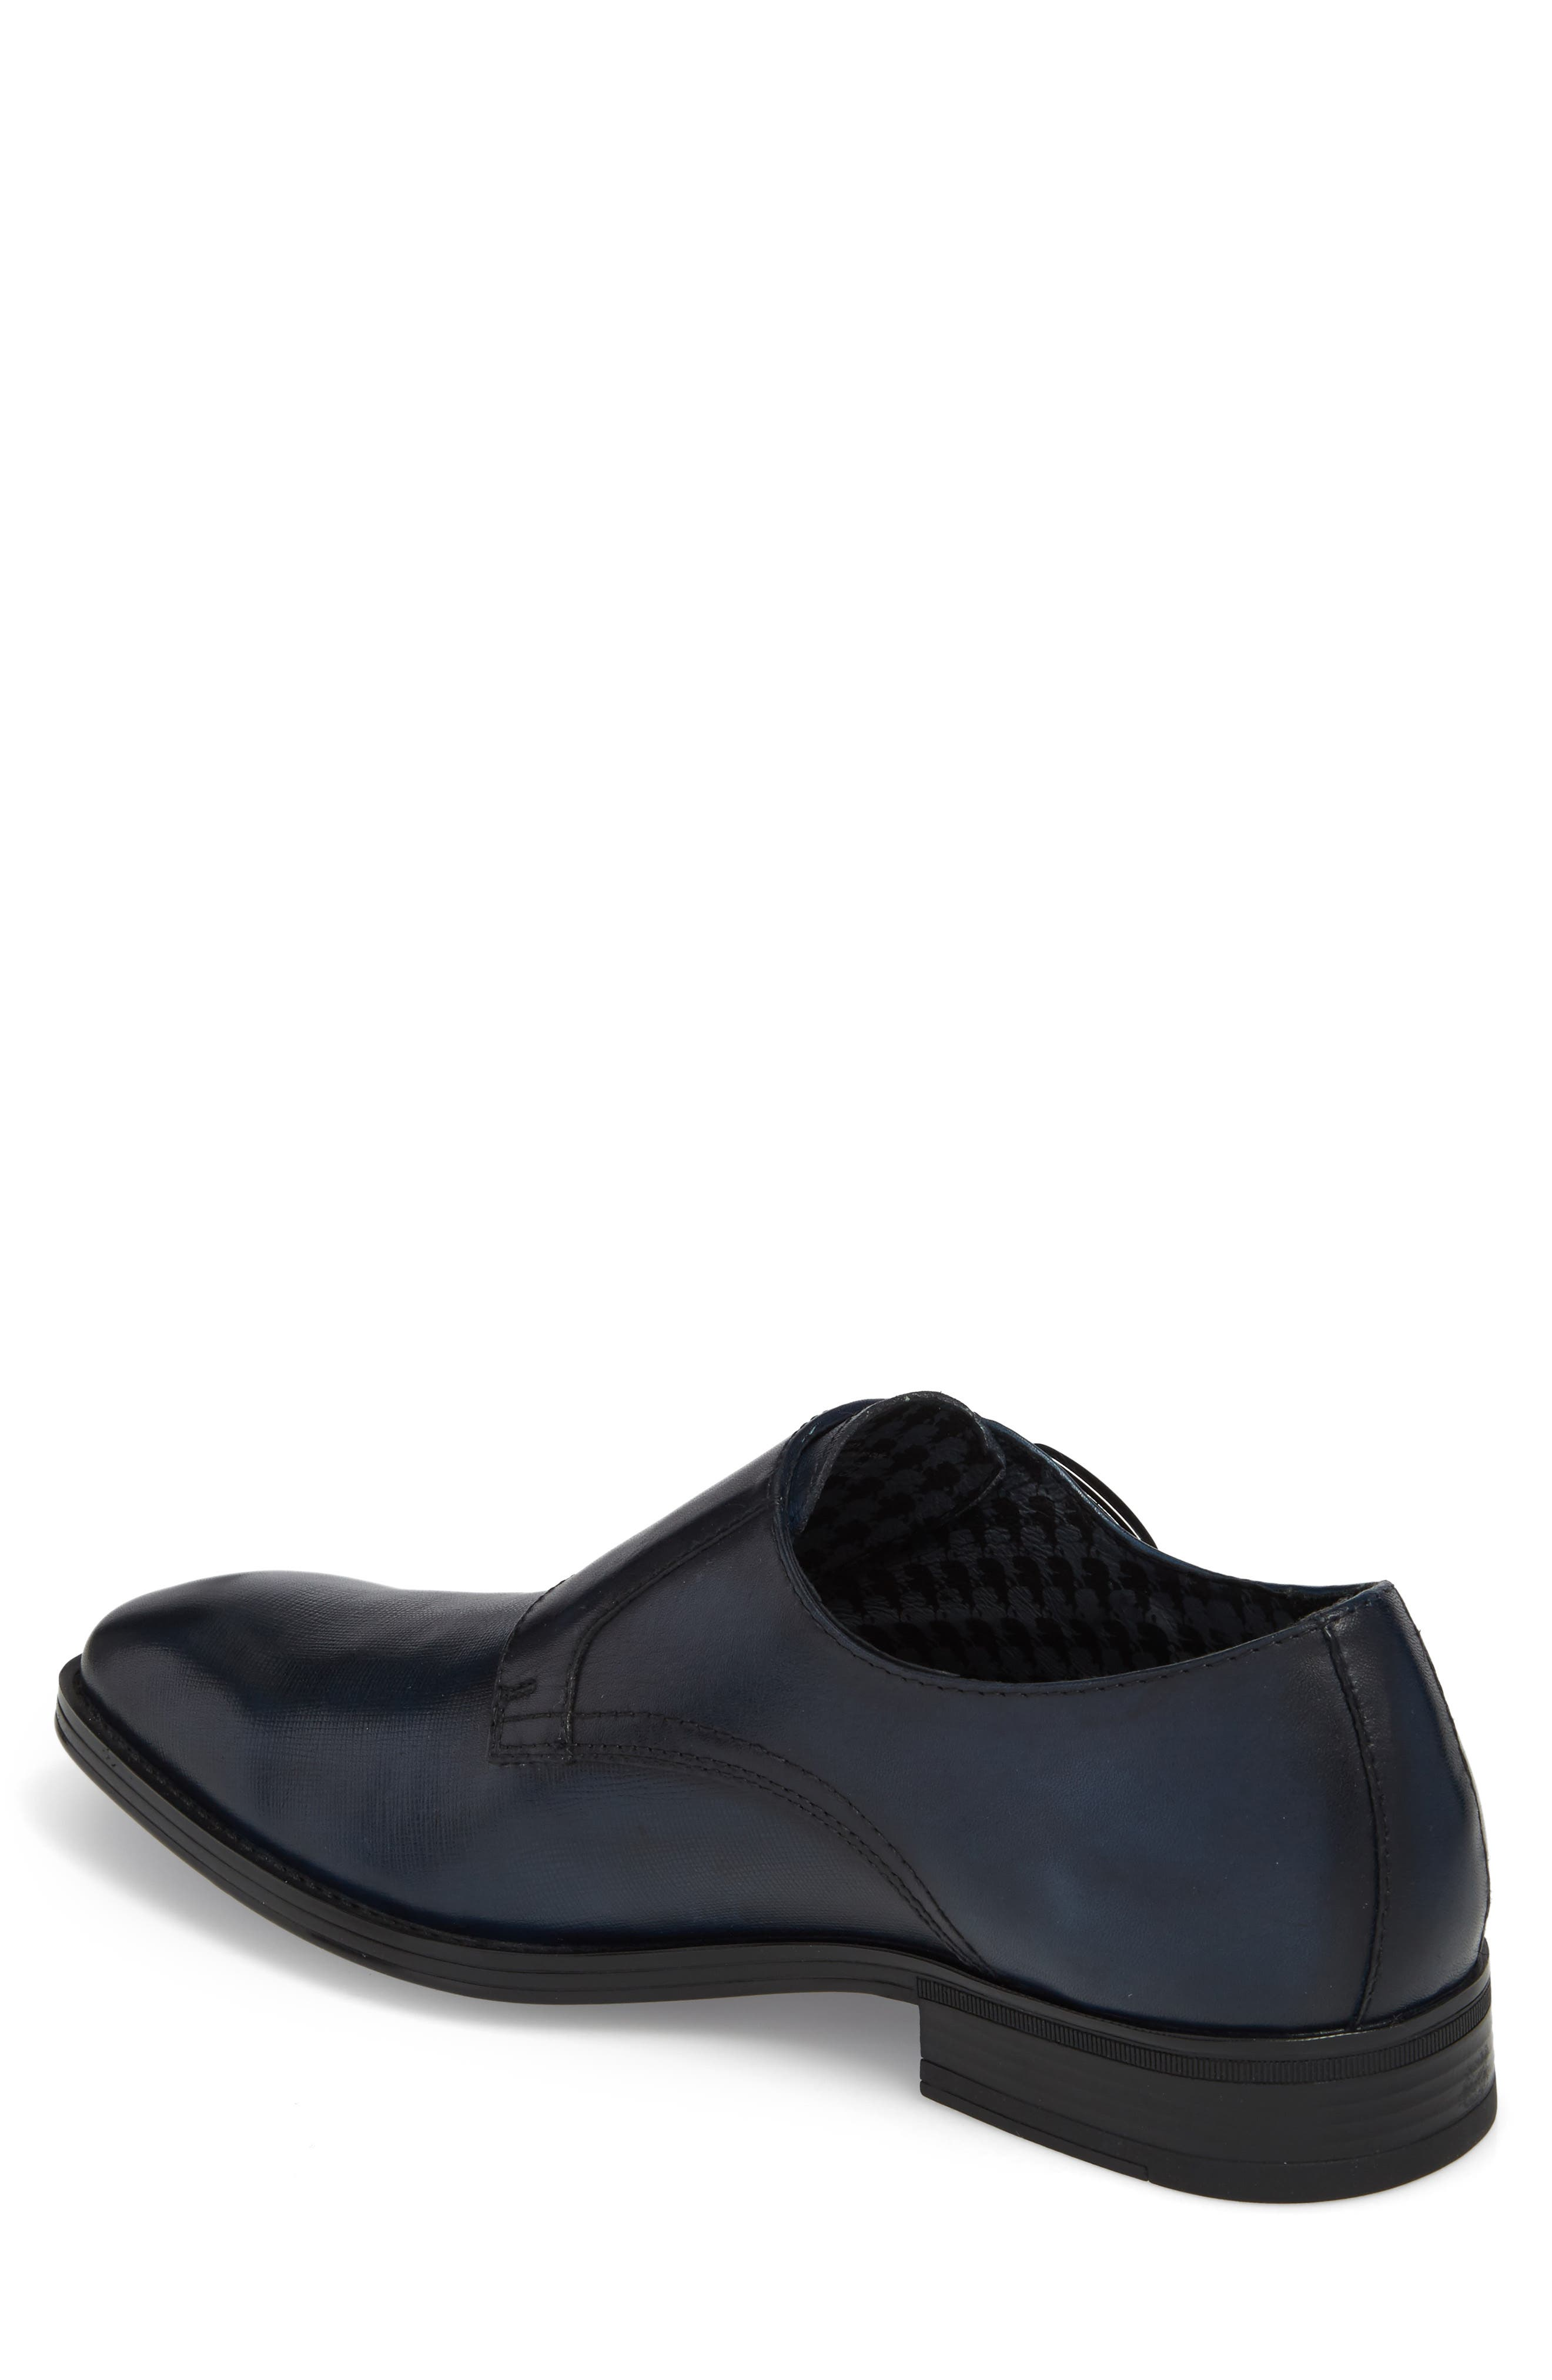 Karl Lagerfeld Double Strap Monk Shoe,                             Alternate thumbnail 2, color,                             Navy